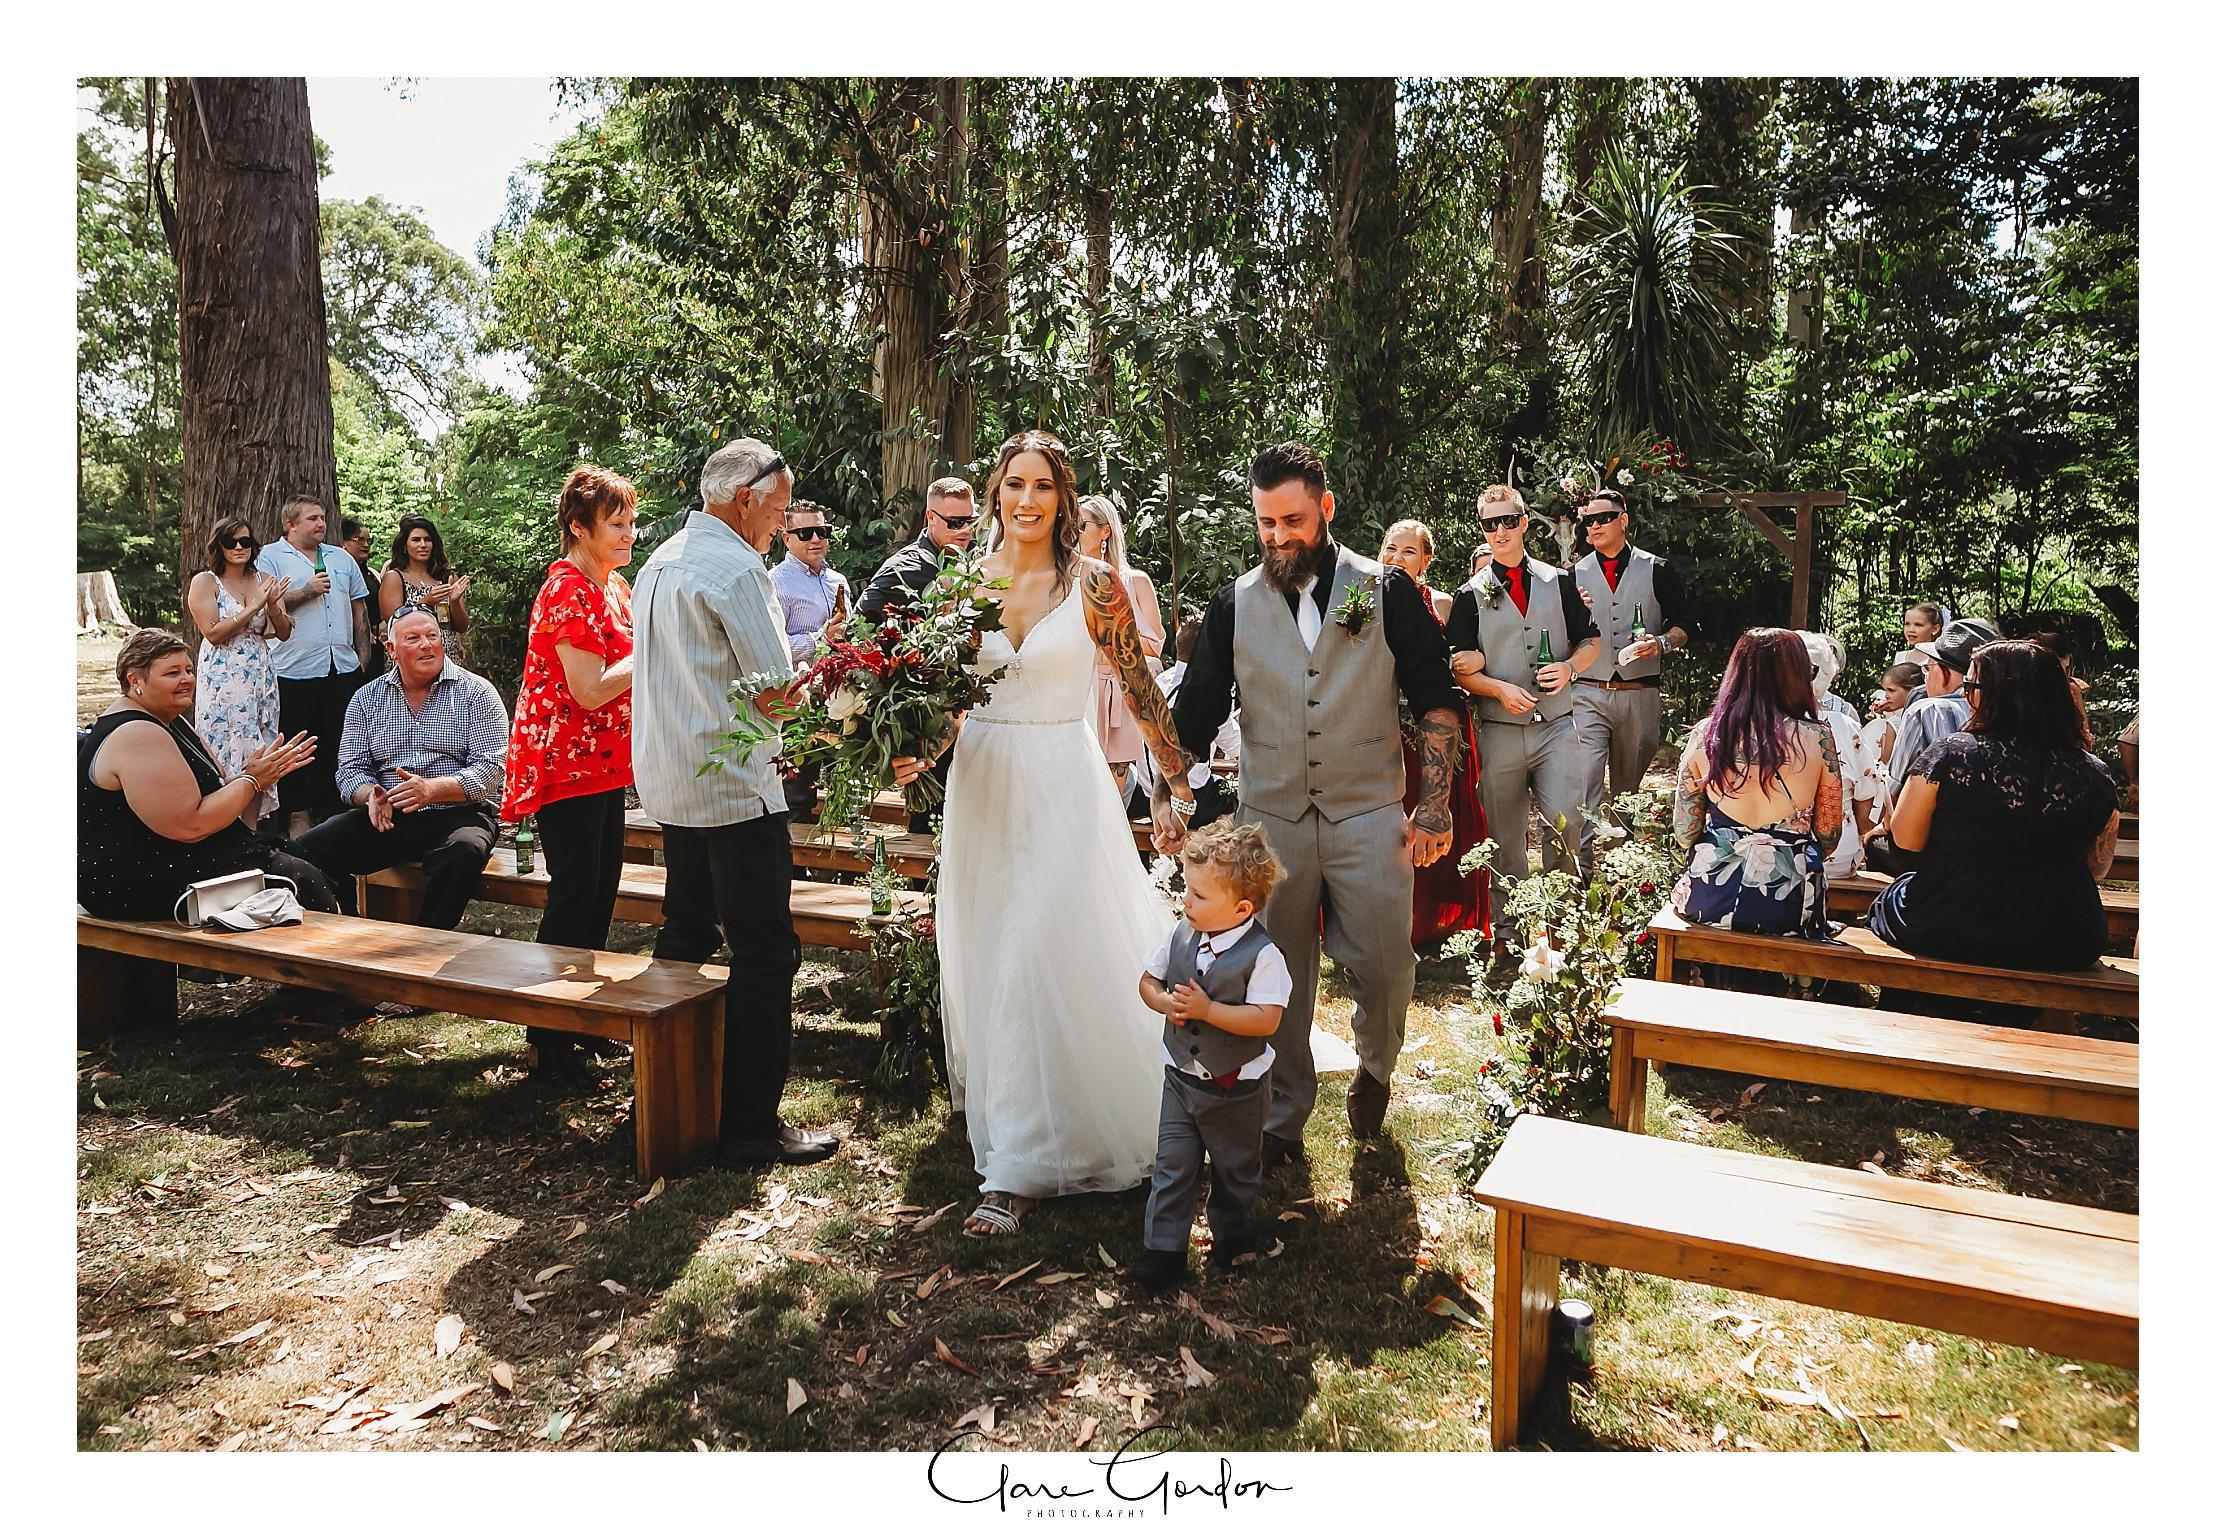 Waikato-wedding-photographer-Forest-weddnig-Hamilton-wedding-Newzealand (77).jpg